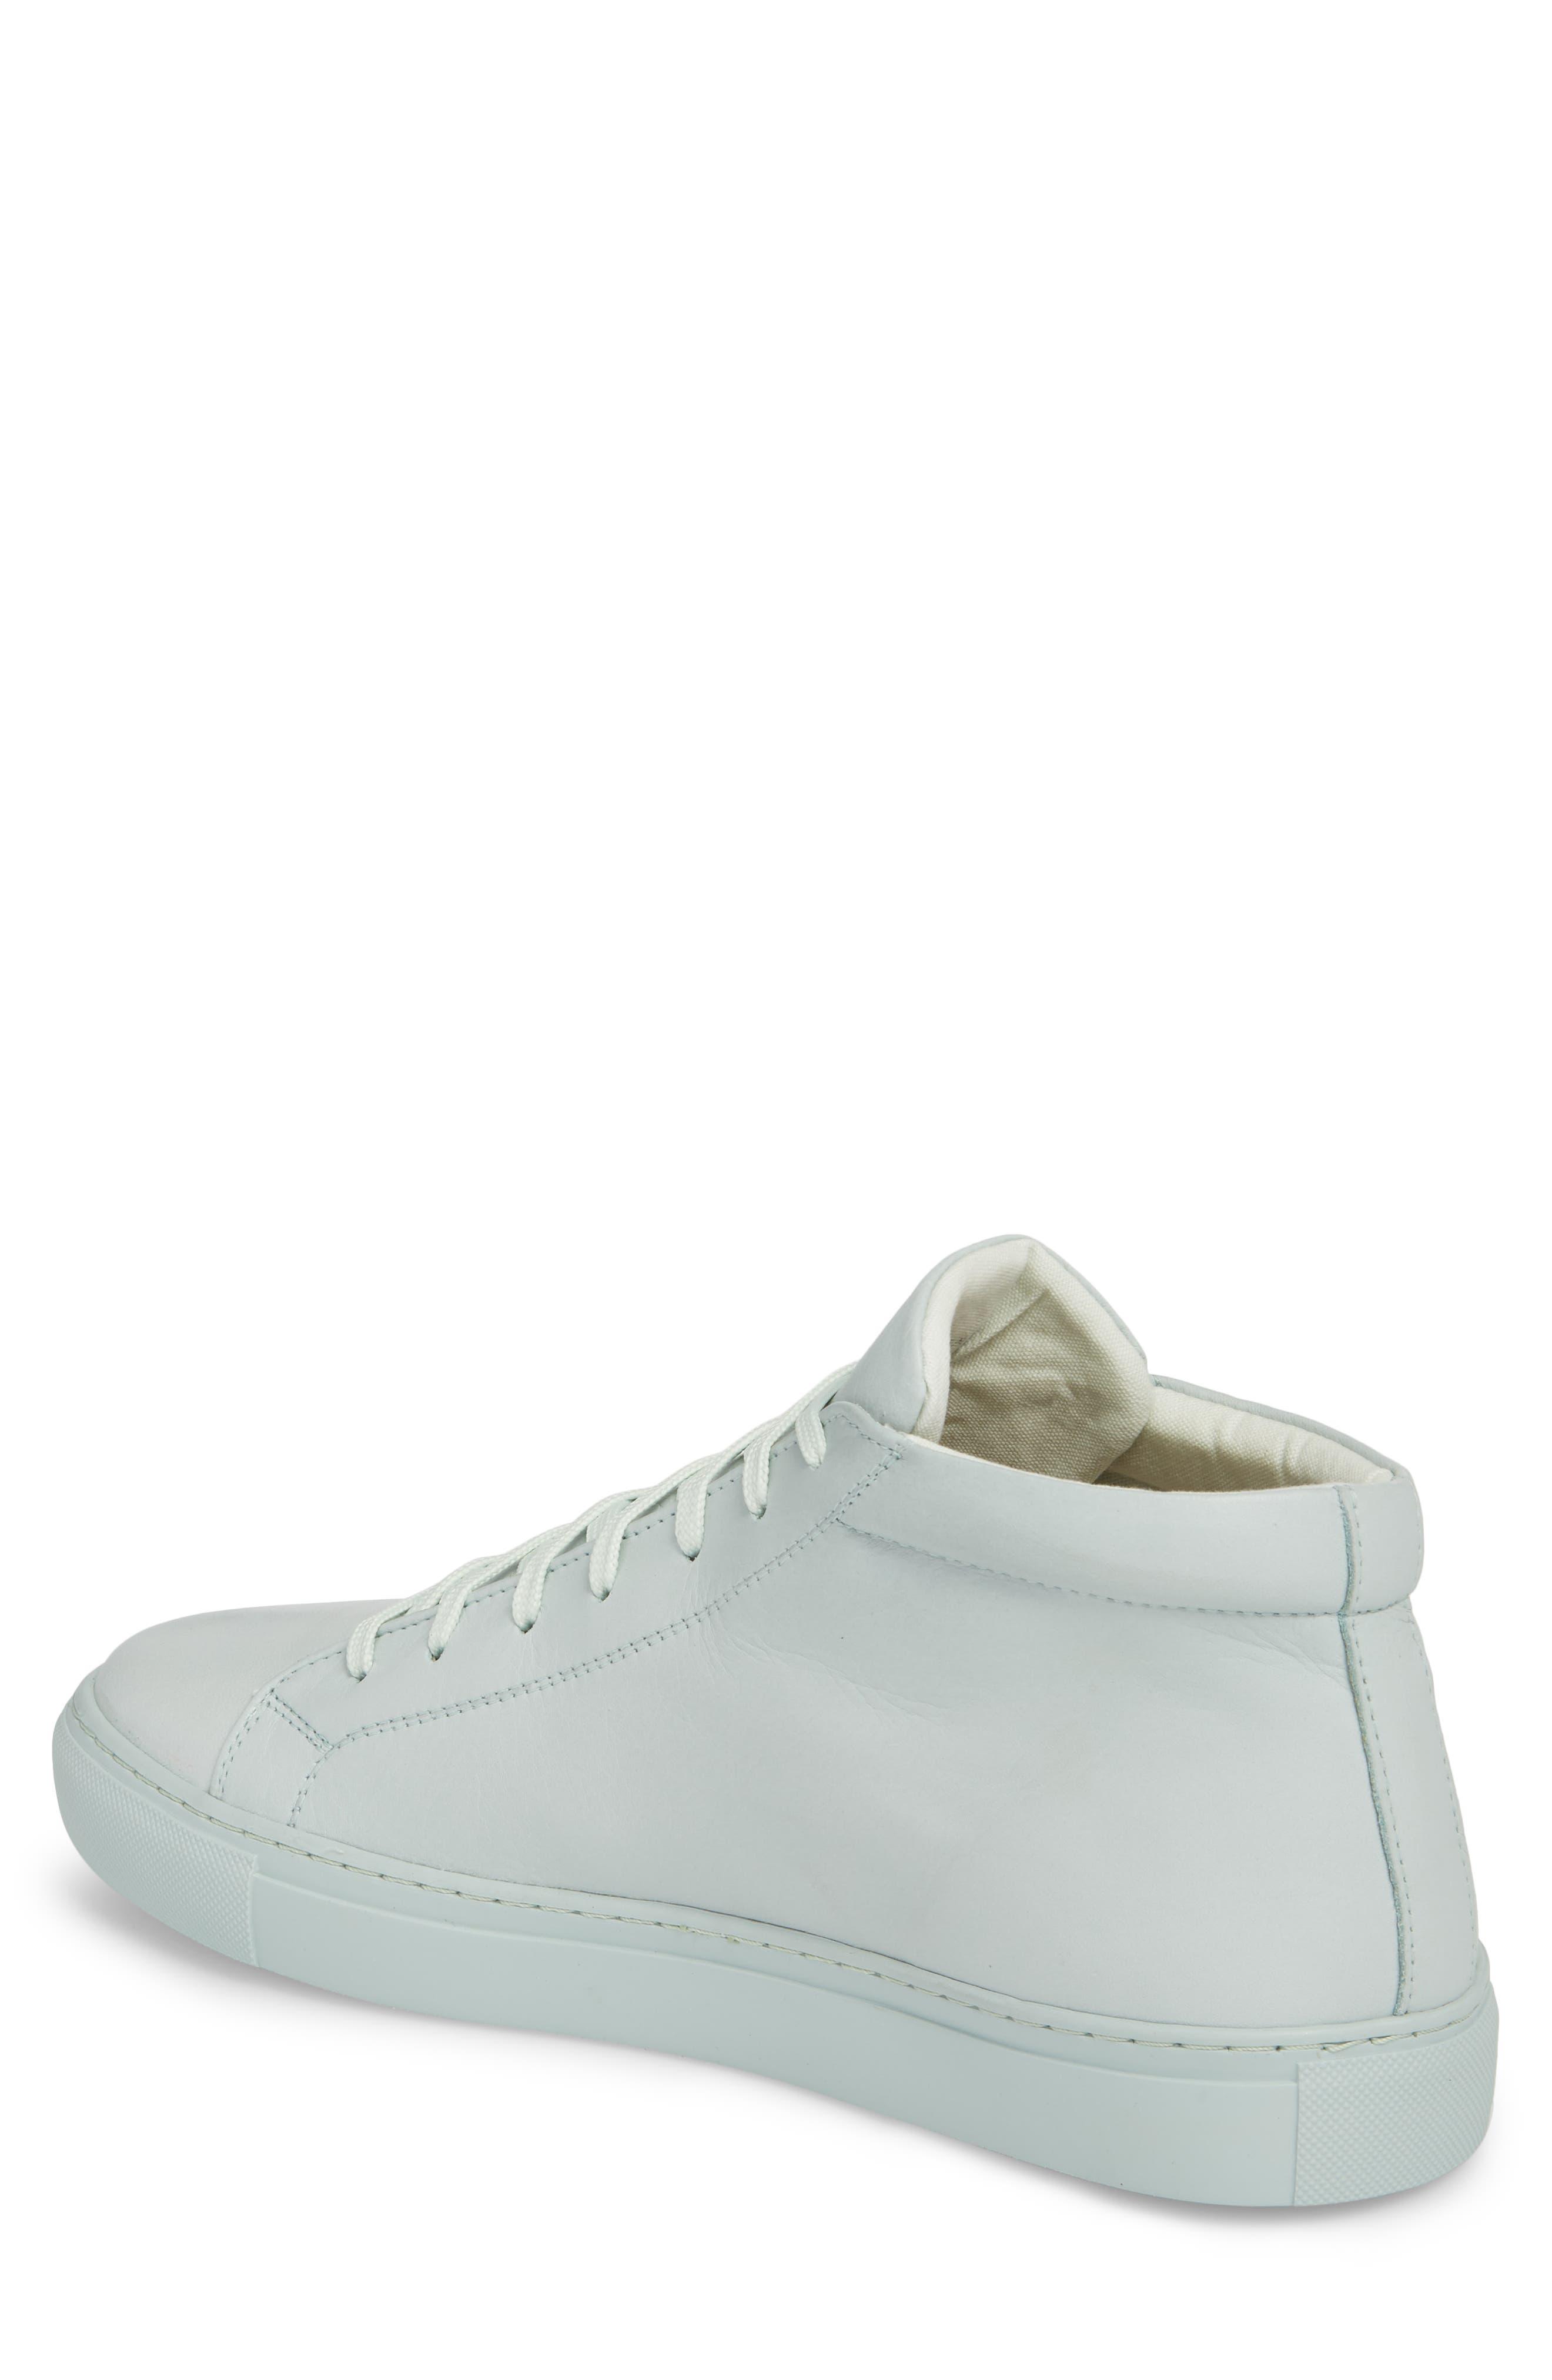 Lexington Mid Top Sneaker,                             Alternate thumbnail 2, color,                             Mint Green Leather